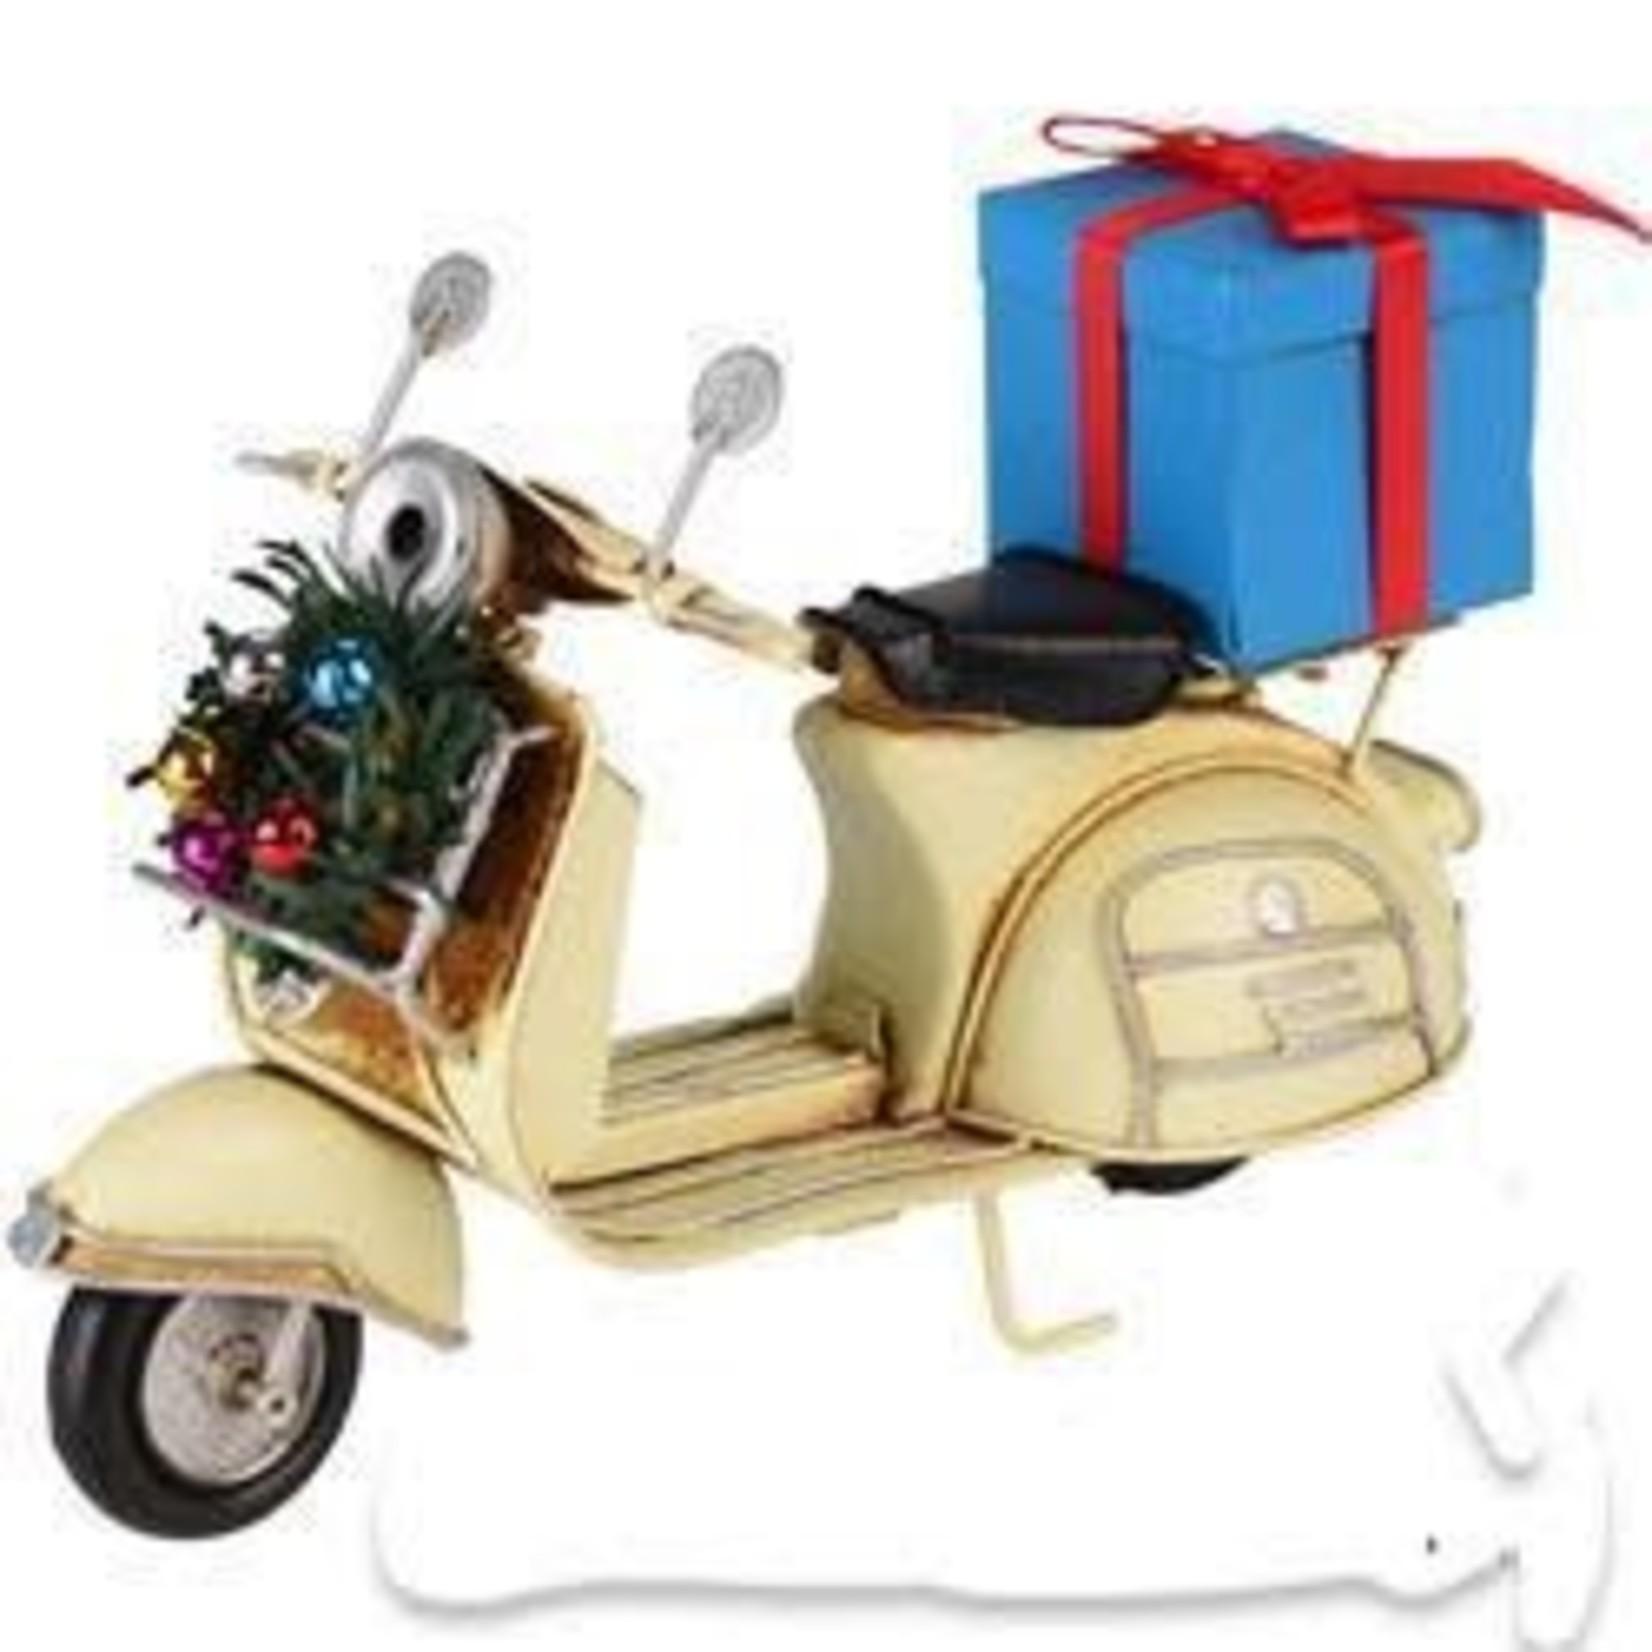 Lifestyle Toy, Vespa Scooter Cream Present/Wreath